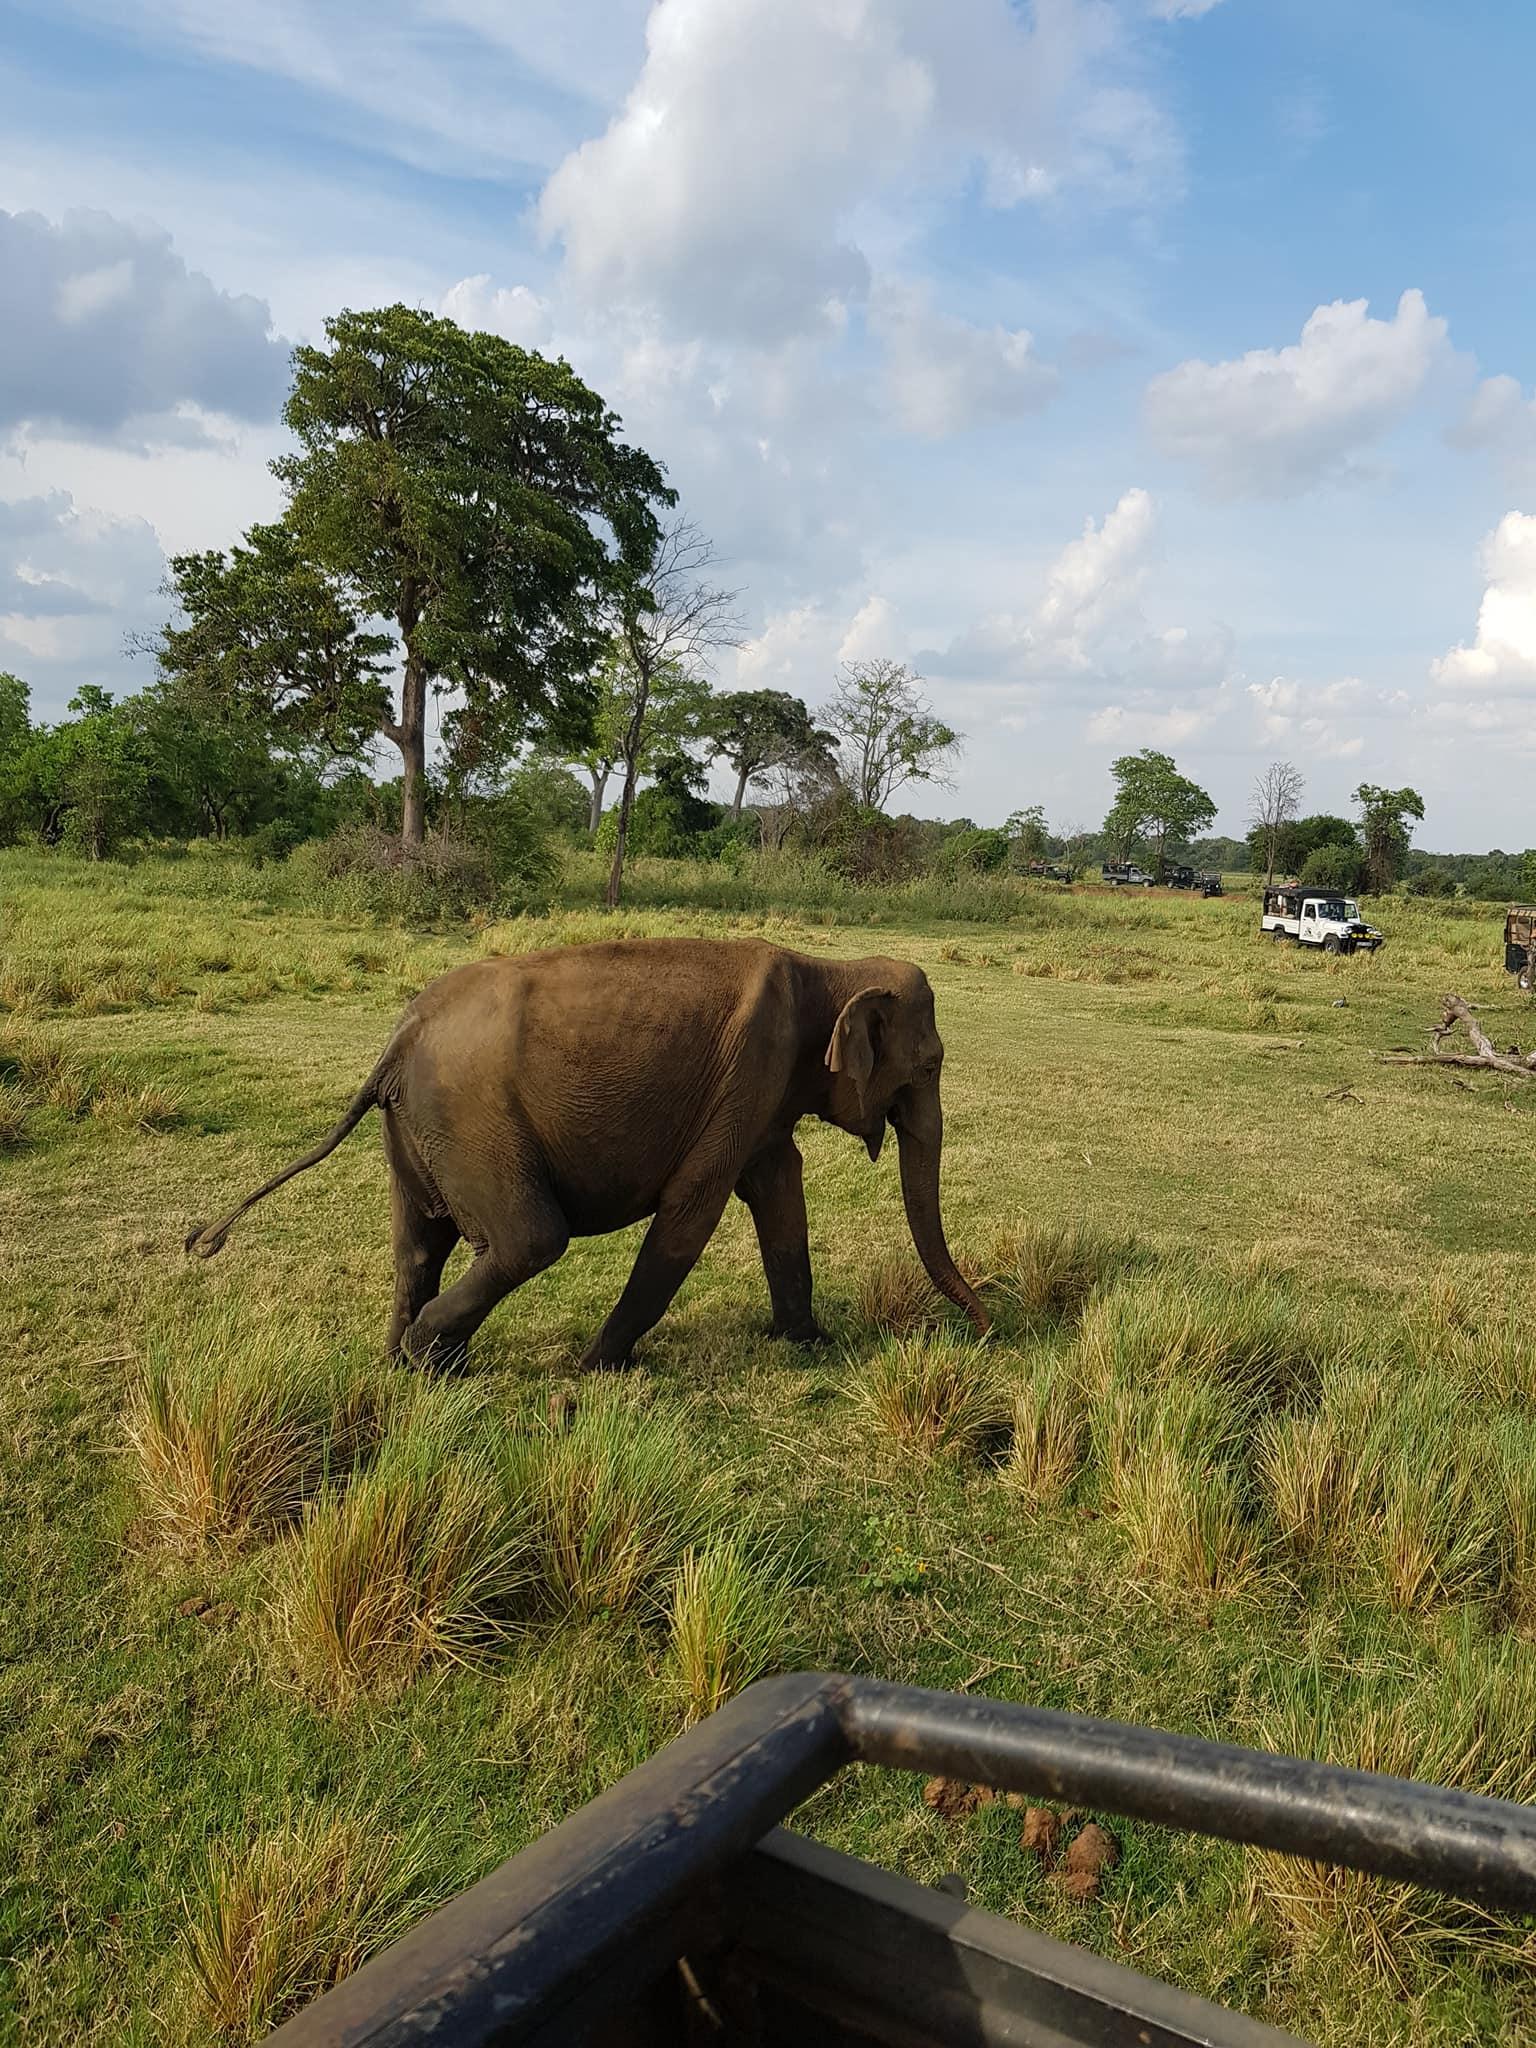 invite-to-paradise-sri-lanka-maldives-holiday-honeymoon-specialists-customer-guest-feedback-zane-lisa-butcher-wild-elephant-wildlife-safari-national-park.jpg